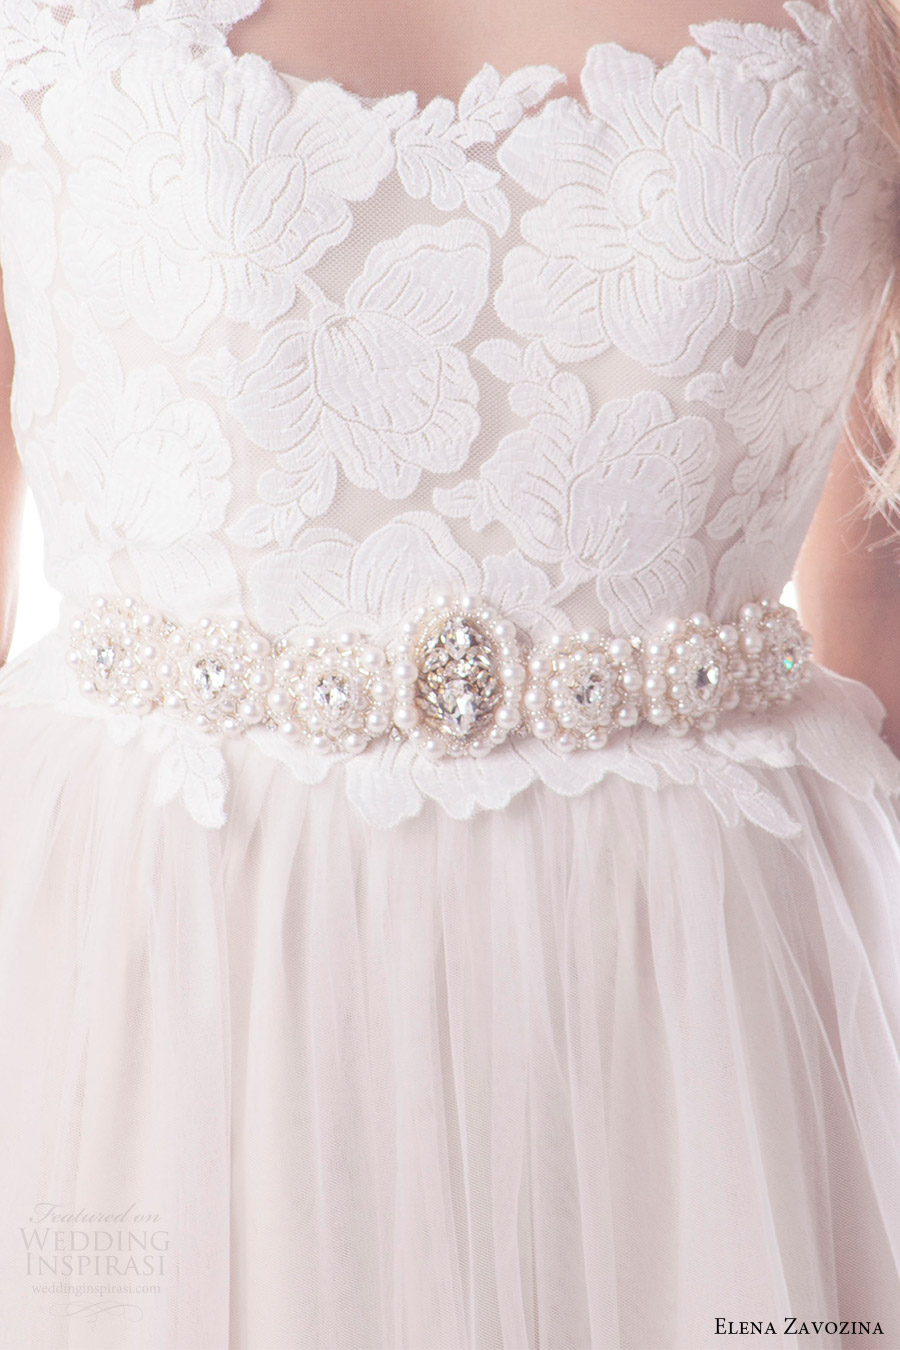 elena zavozina bridal accessories 2016 wedding pearl belt (elena) mv